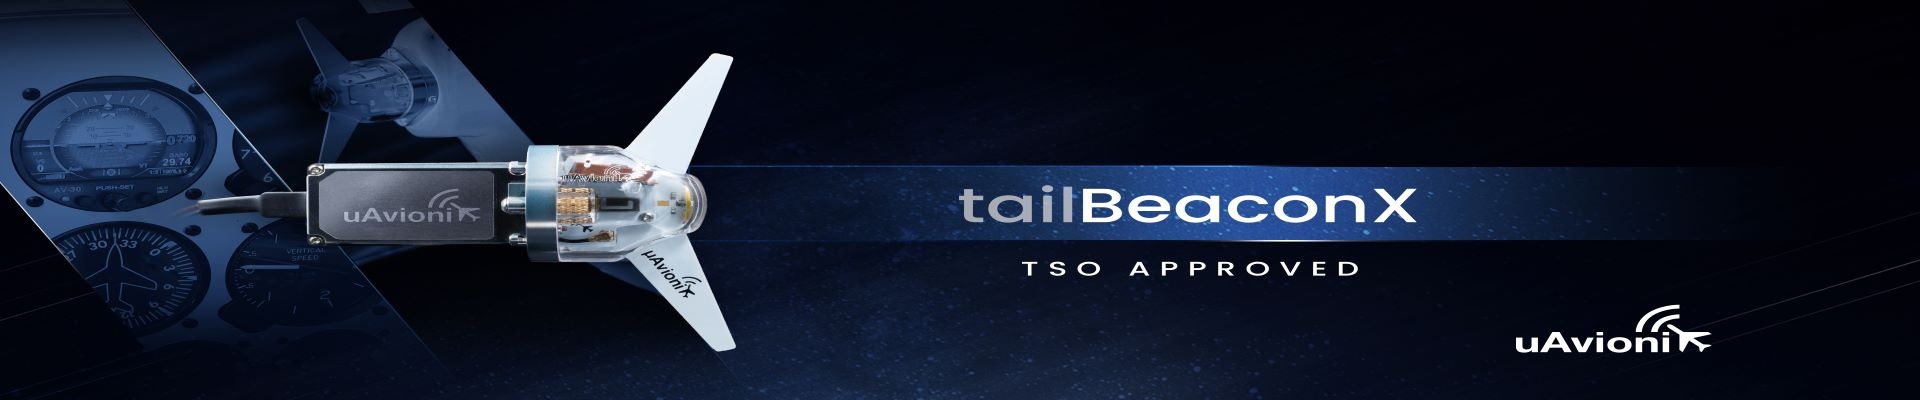 tailBeaconX TSO